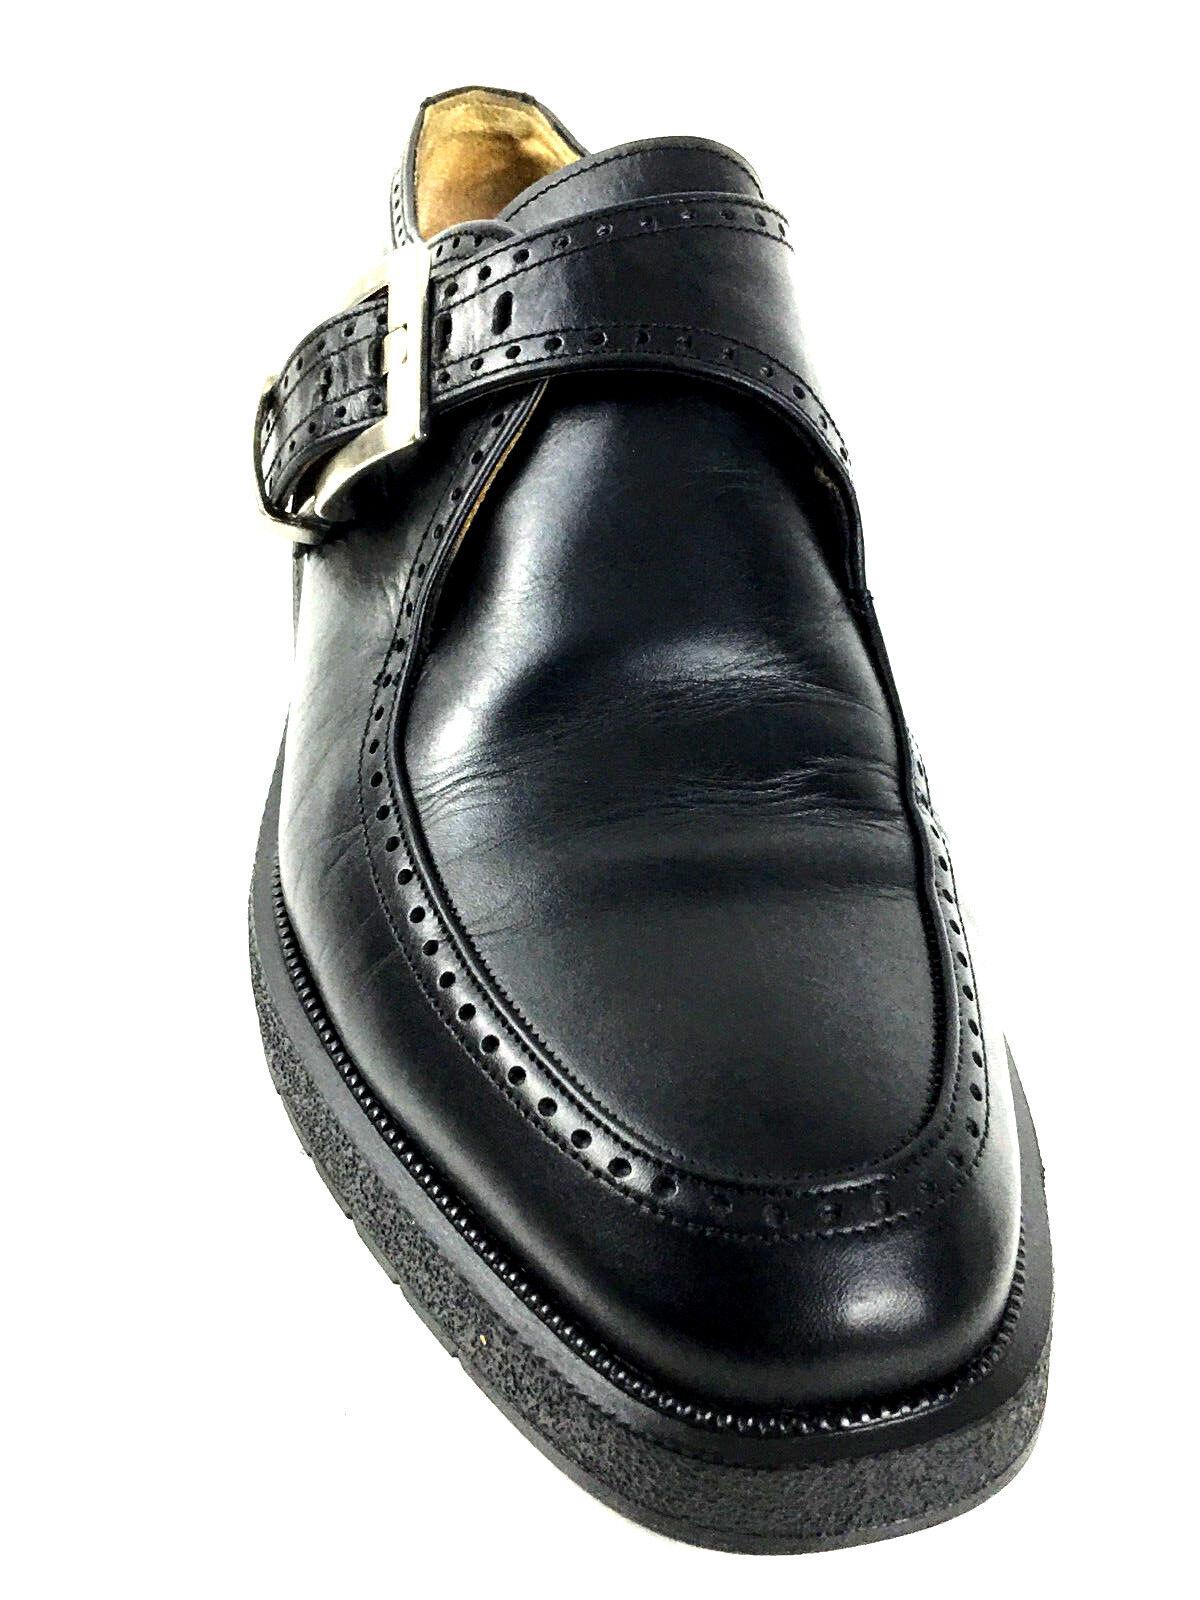 Alberto Guardiani Monk Strap Shoes Black Wmns SZ. EU.39.5 US.8.5-9 Mens US.7-7.5